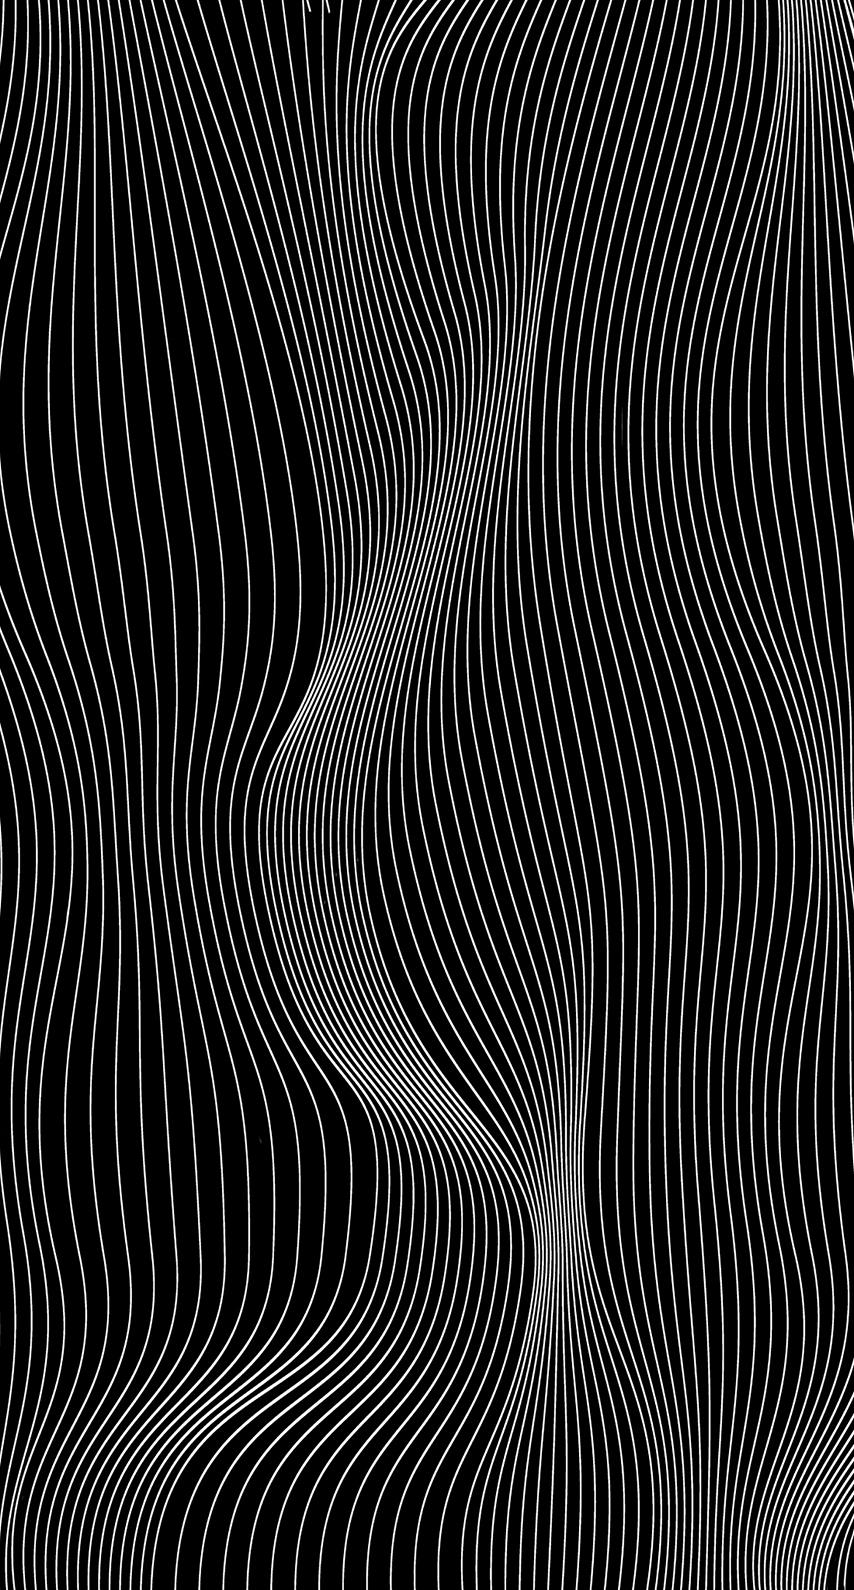 line, curve